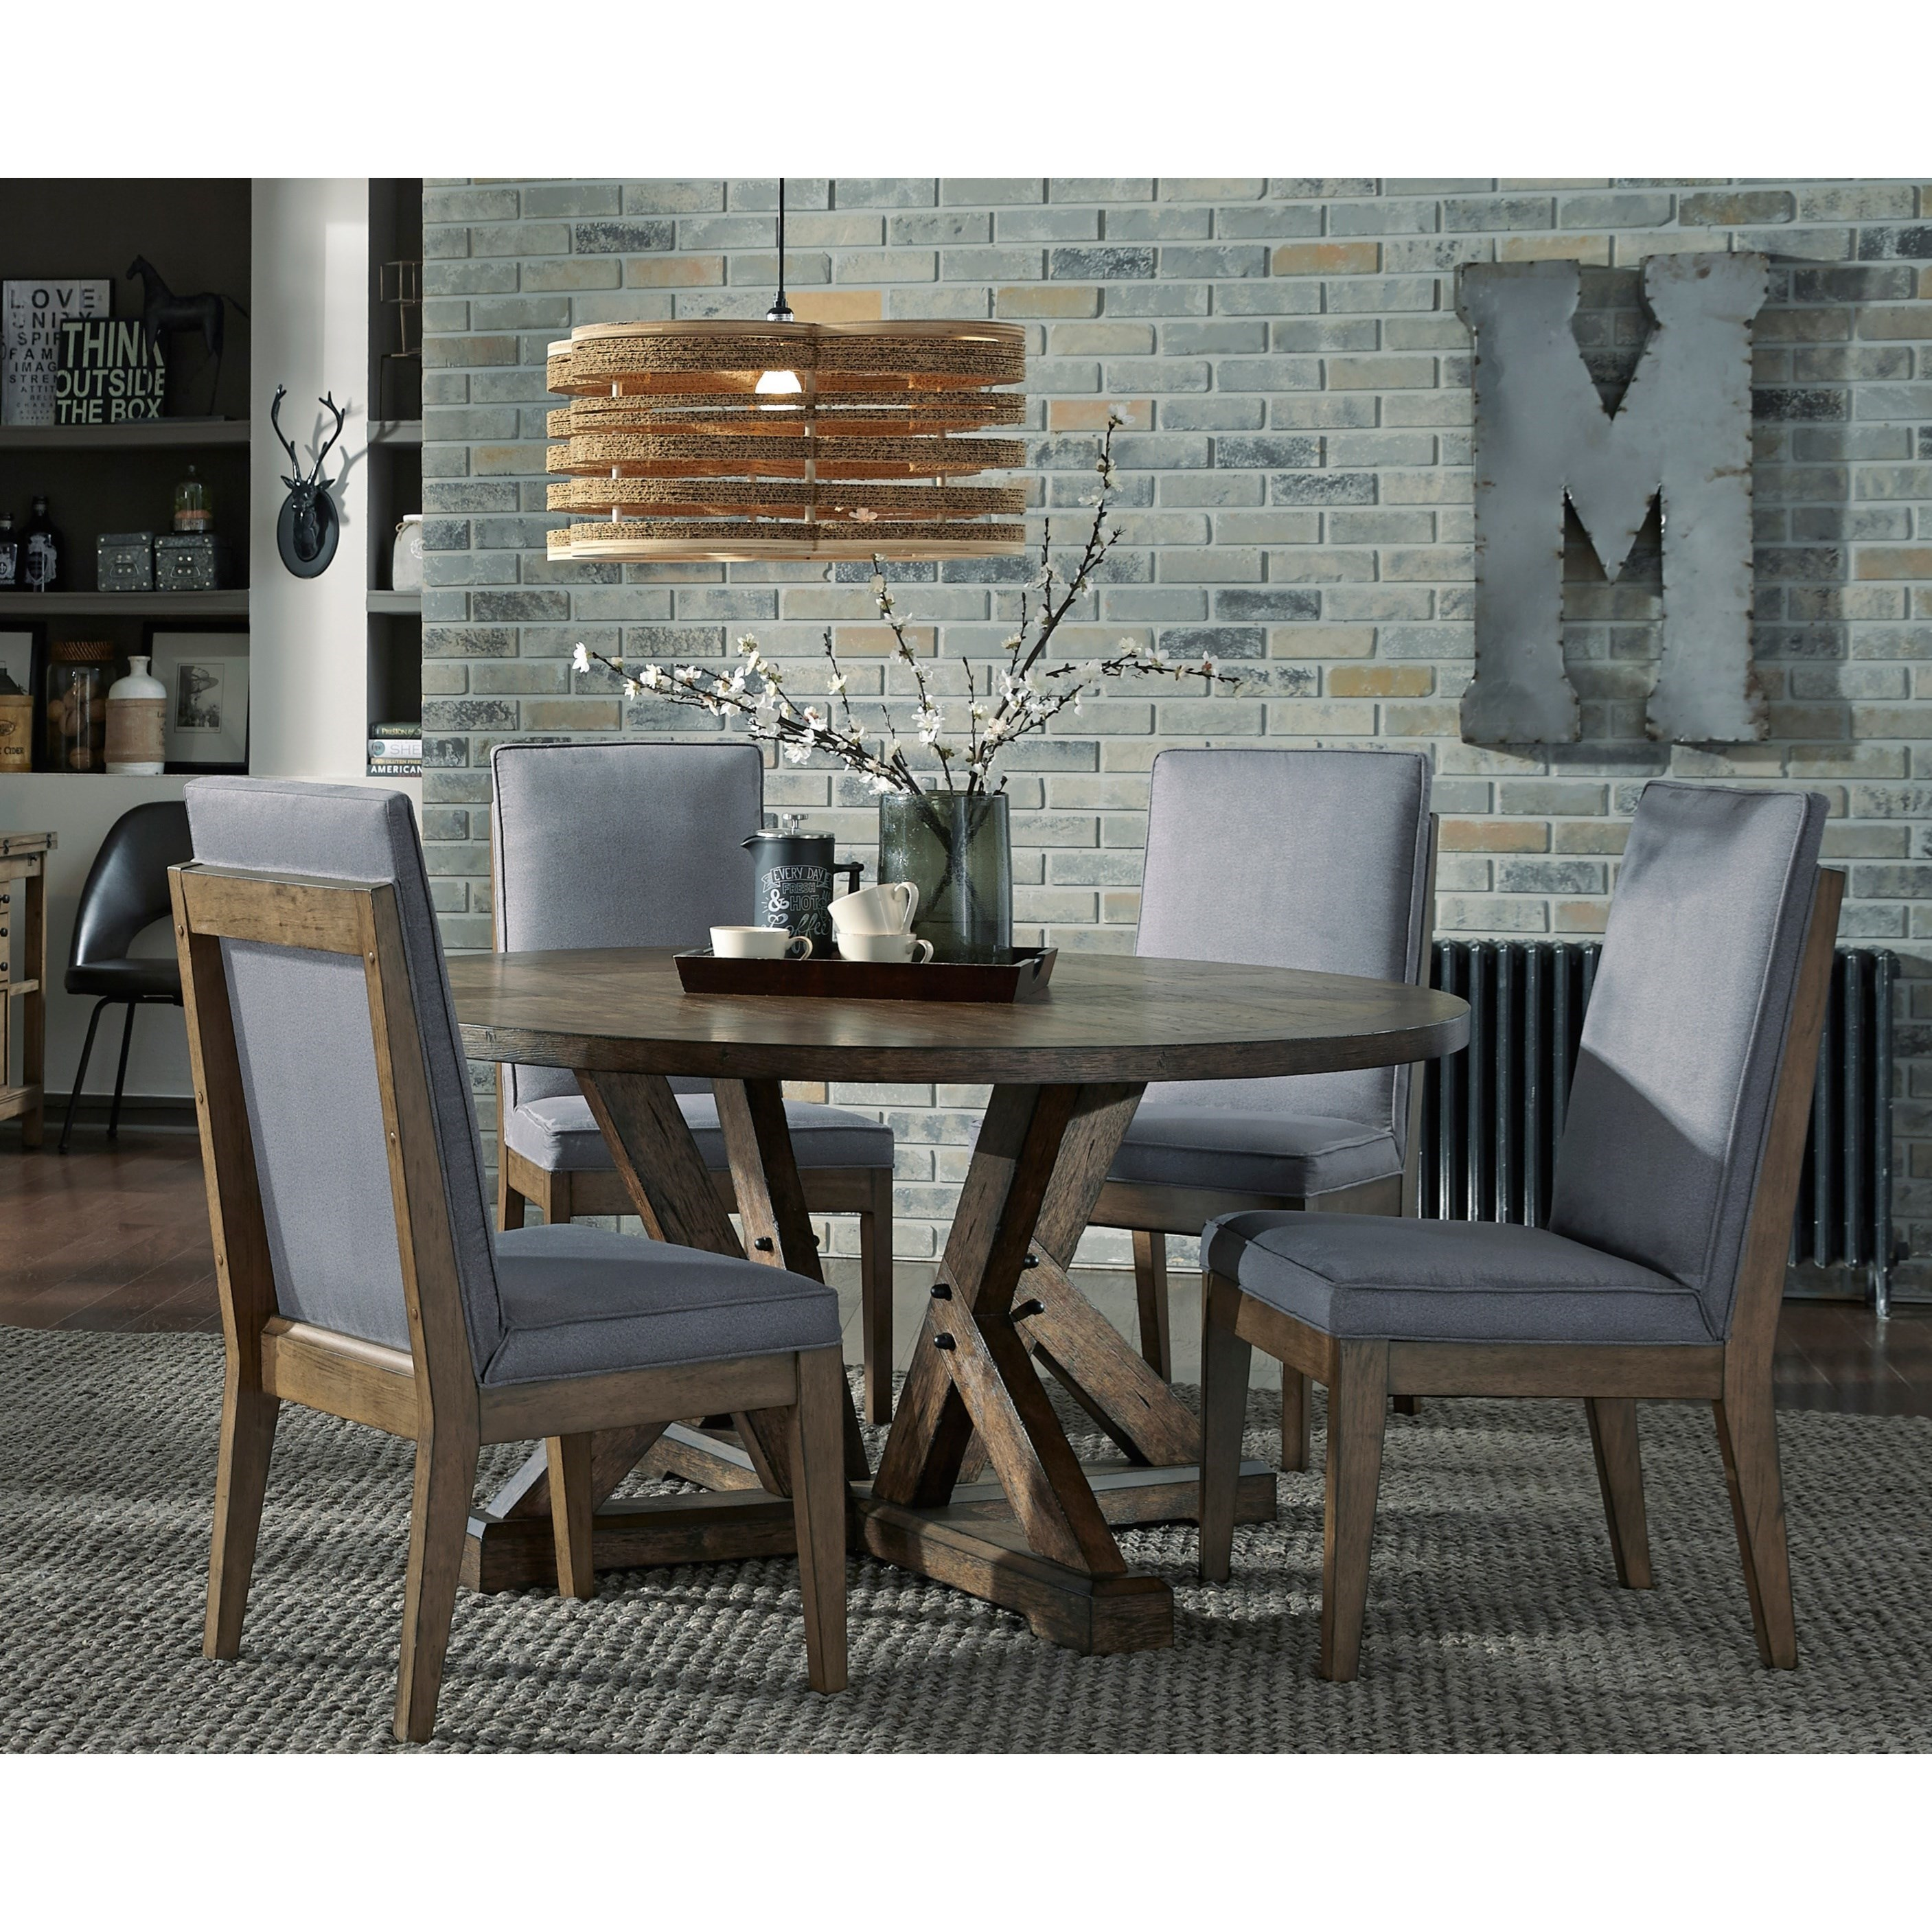 ... Broyhill Furniture PieceworksDobbin Street Piece Works Dining Table ...